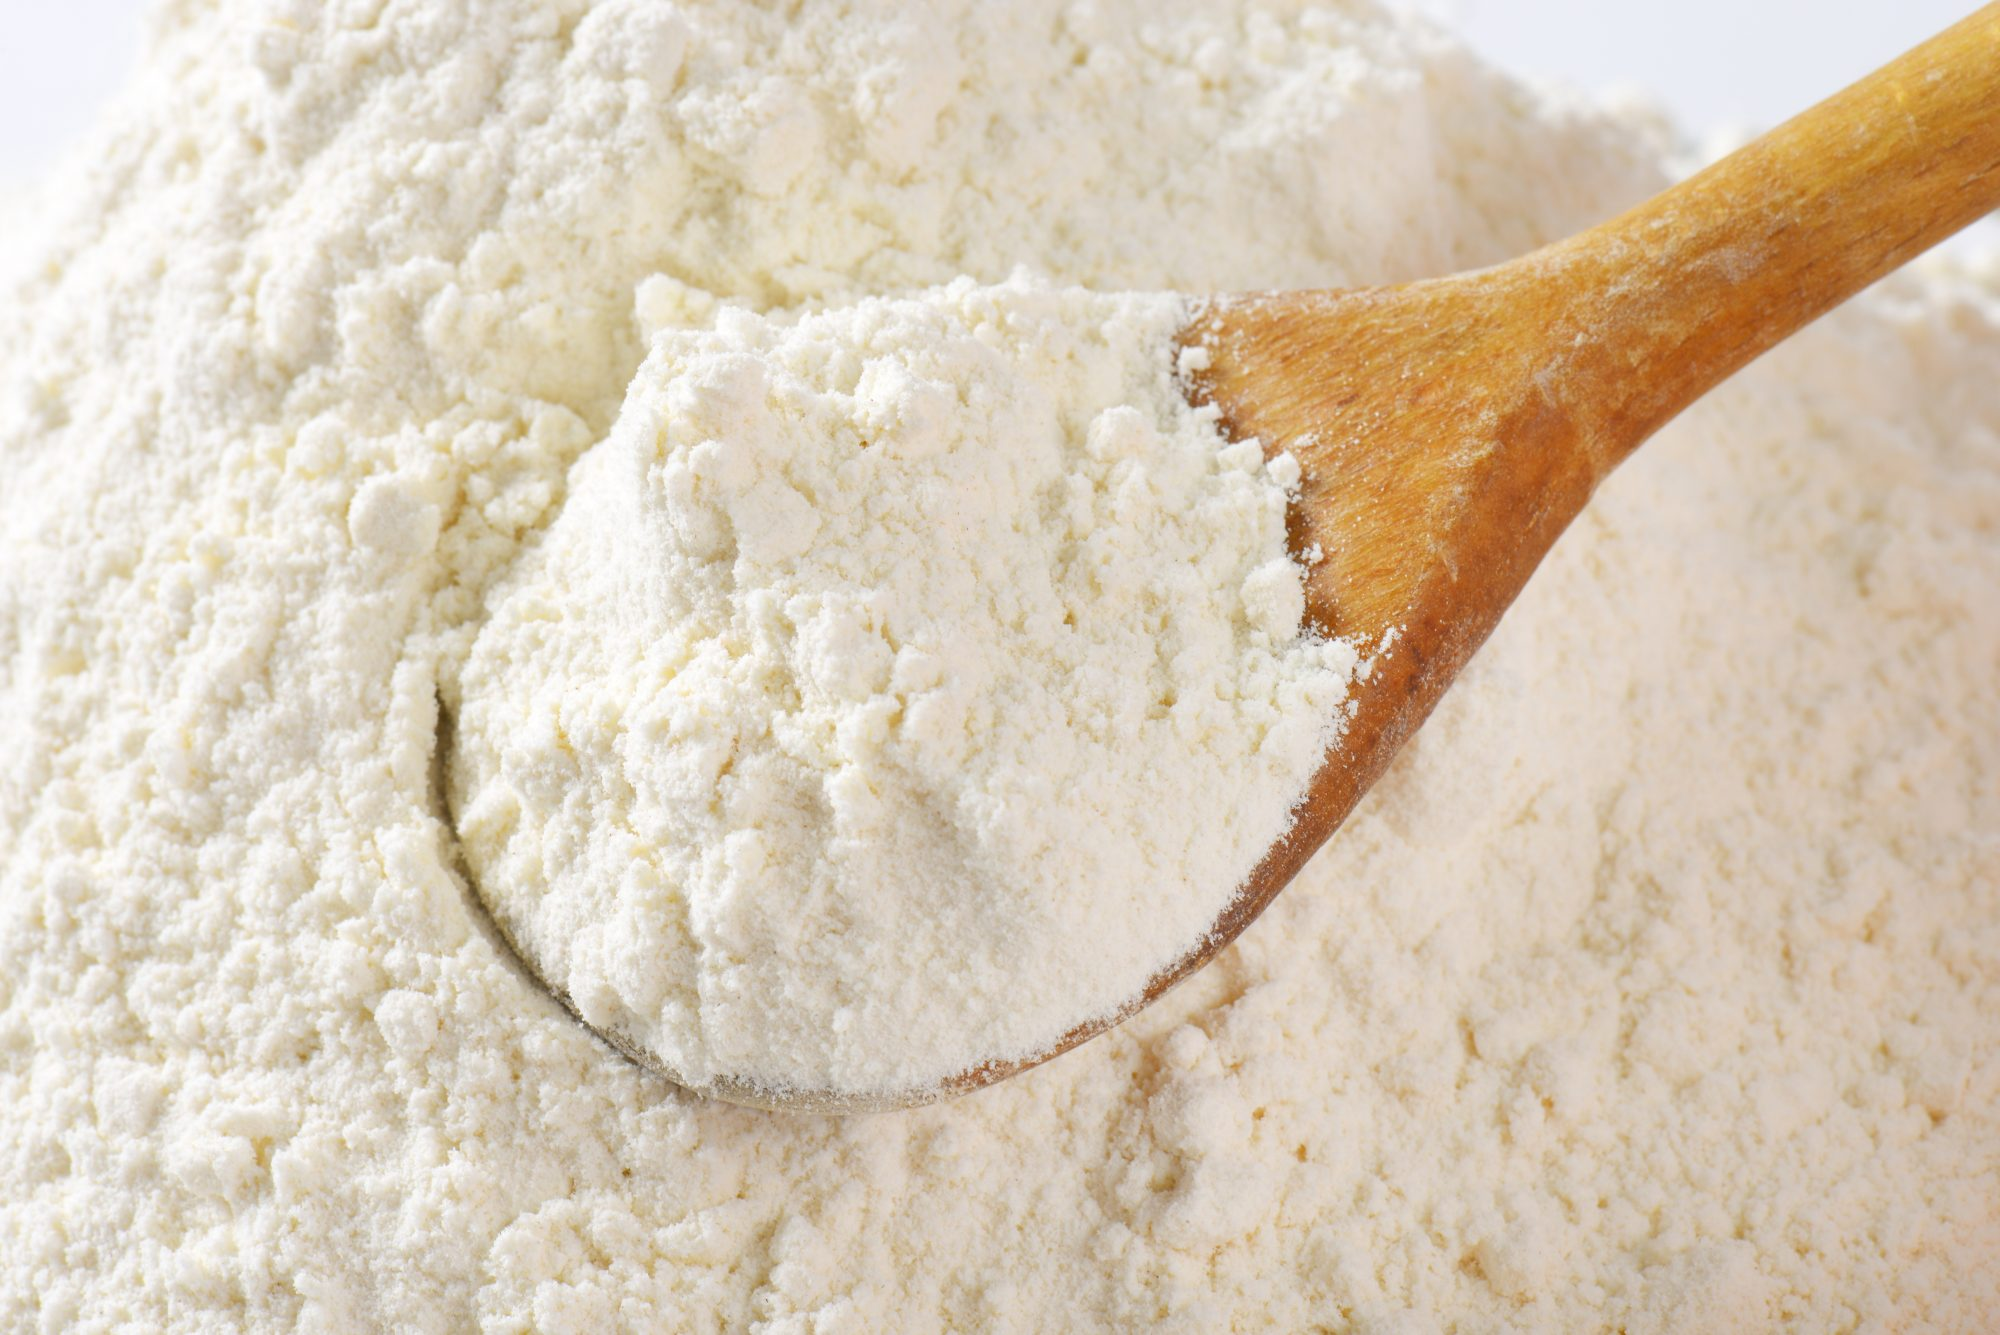 082620_All-Purpose Flour